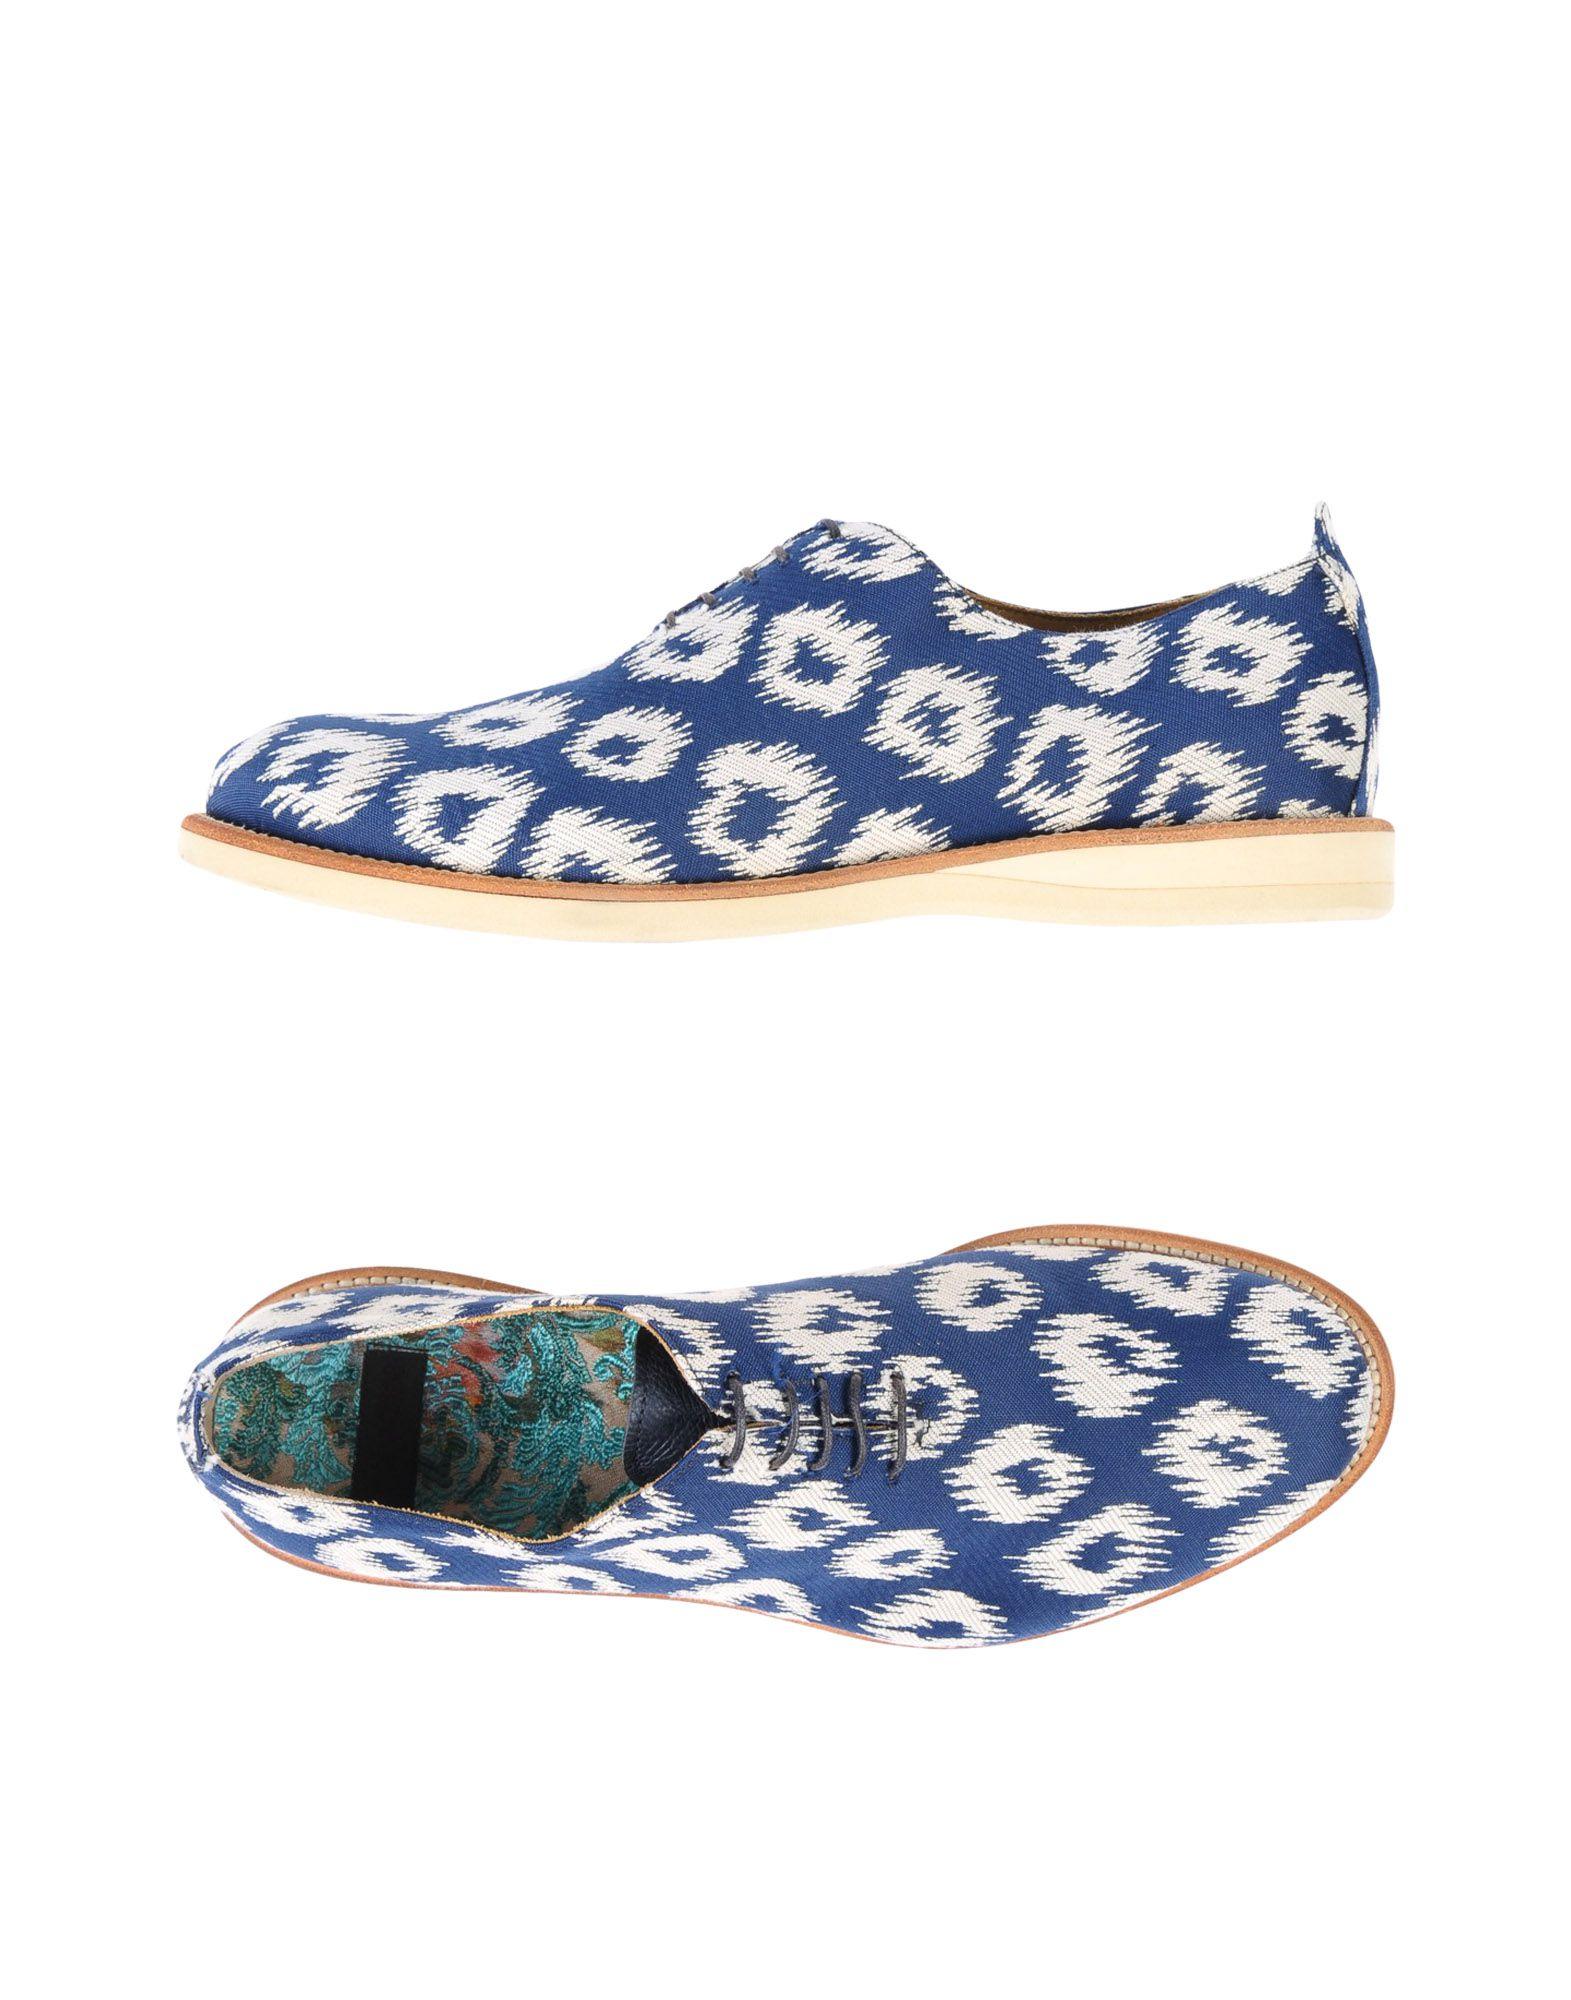 DOLCE & GABBANA Обувь на шнурках poetic licence обувь на шнурках